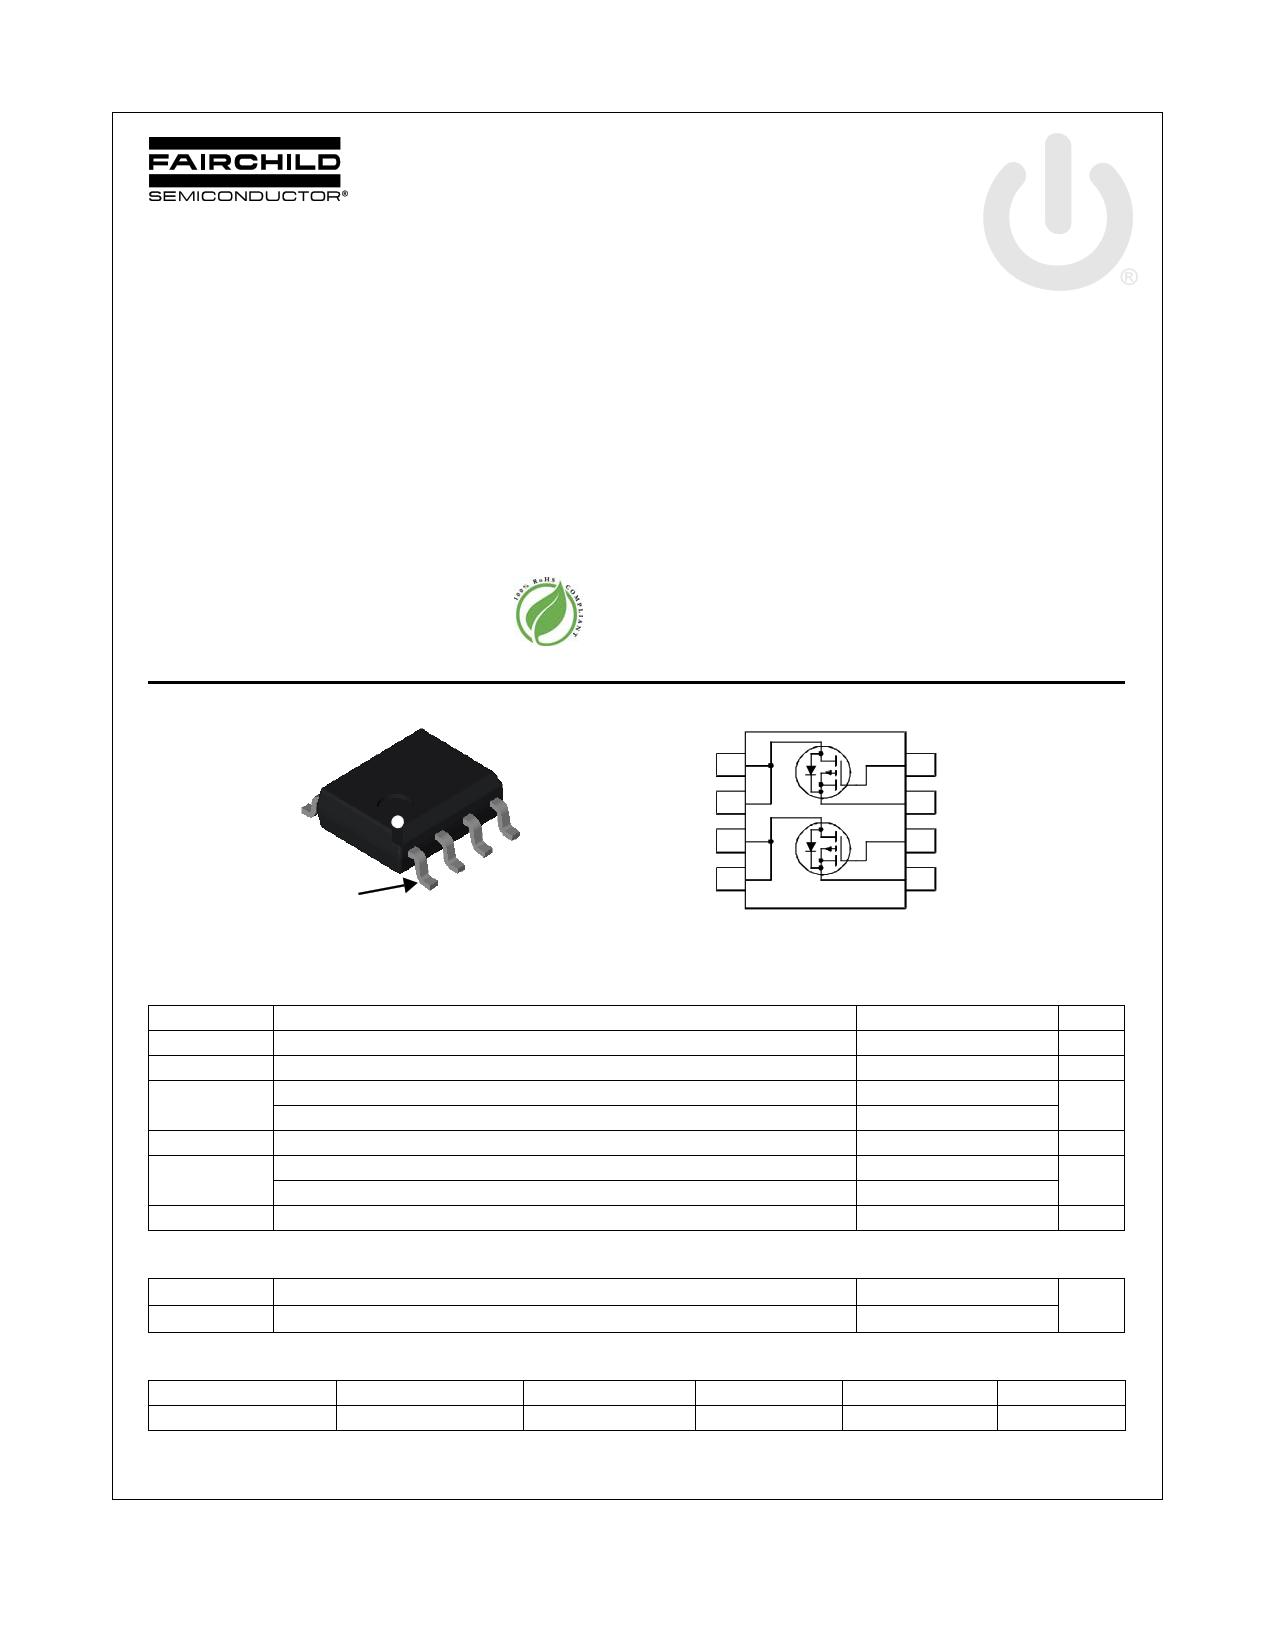 FDS8935 데이터시트 및 FDS8935 PDF